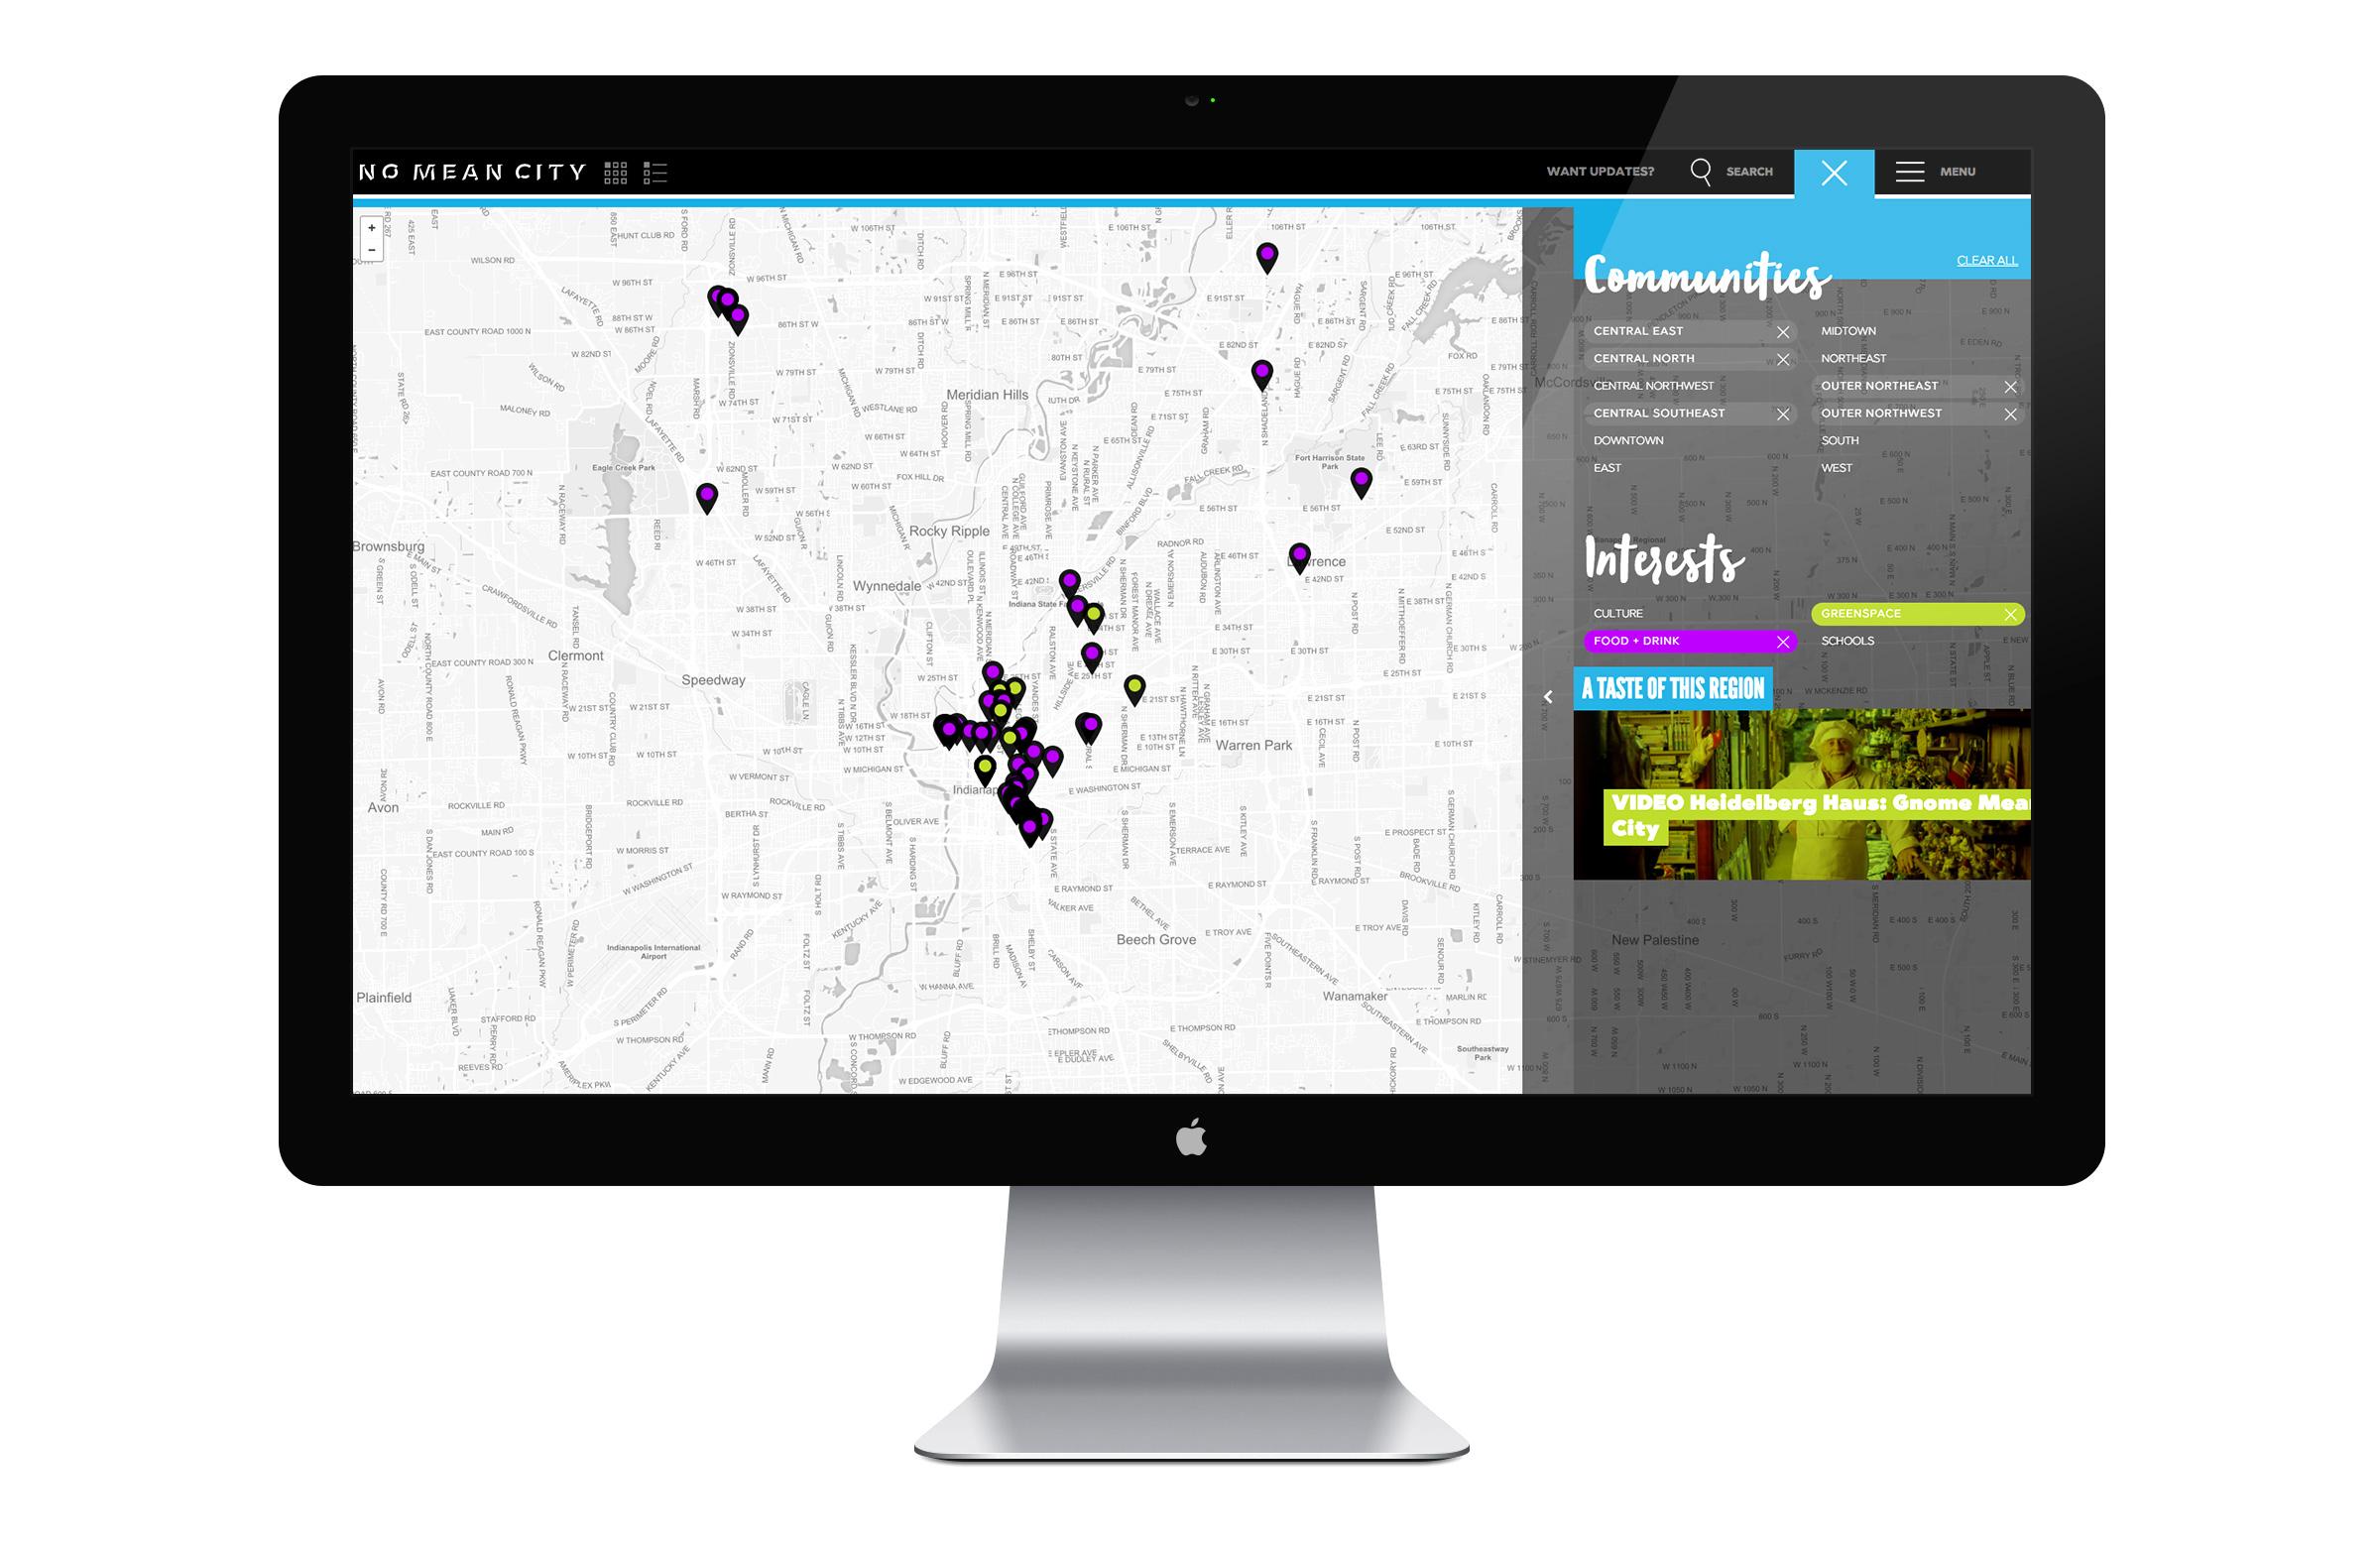 No Mean City Website - Map